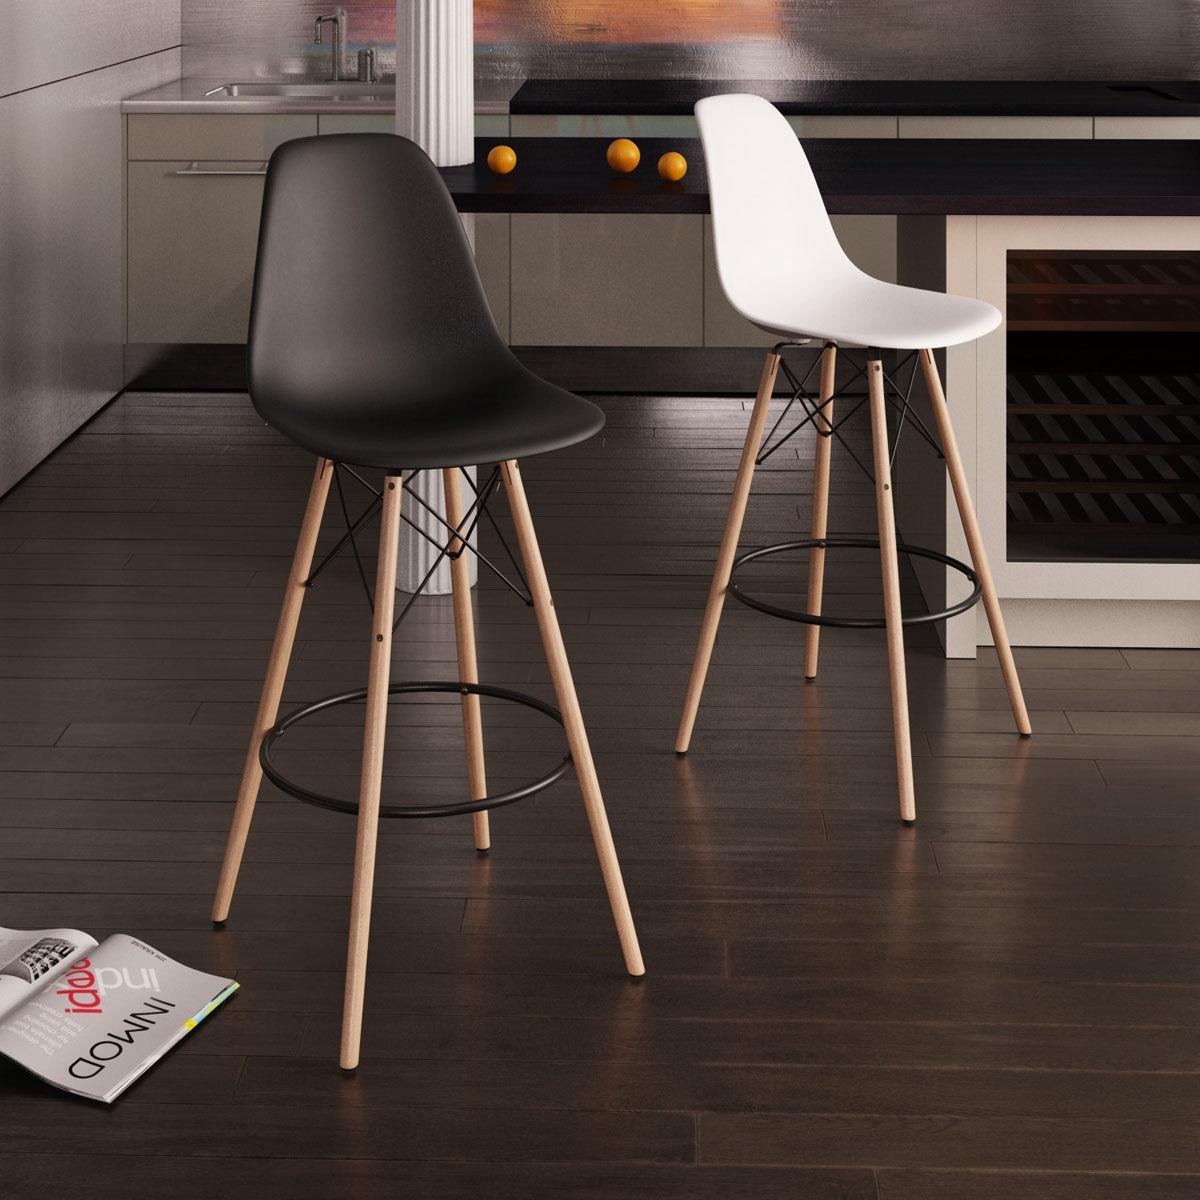 Molded Plastic Bar Stool With Wood Legs. U003e